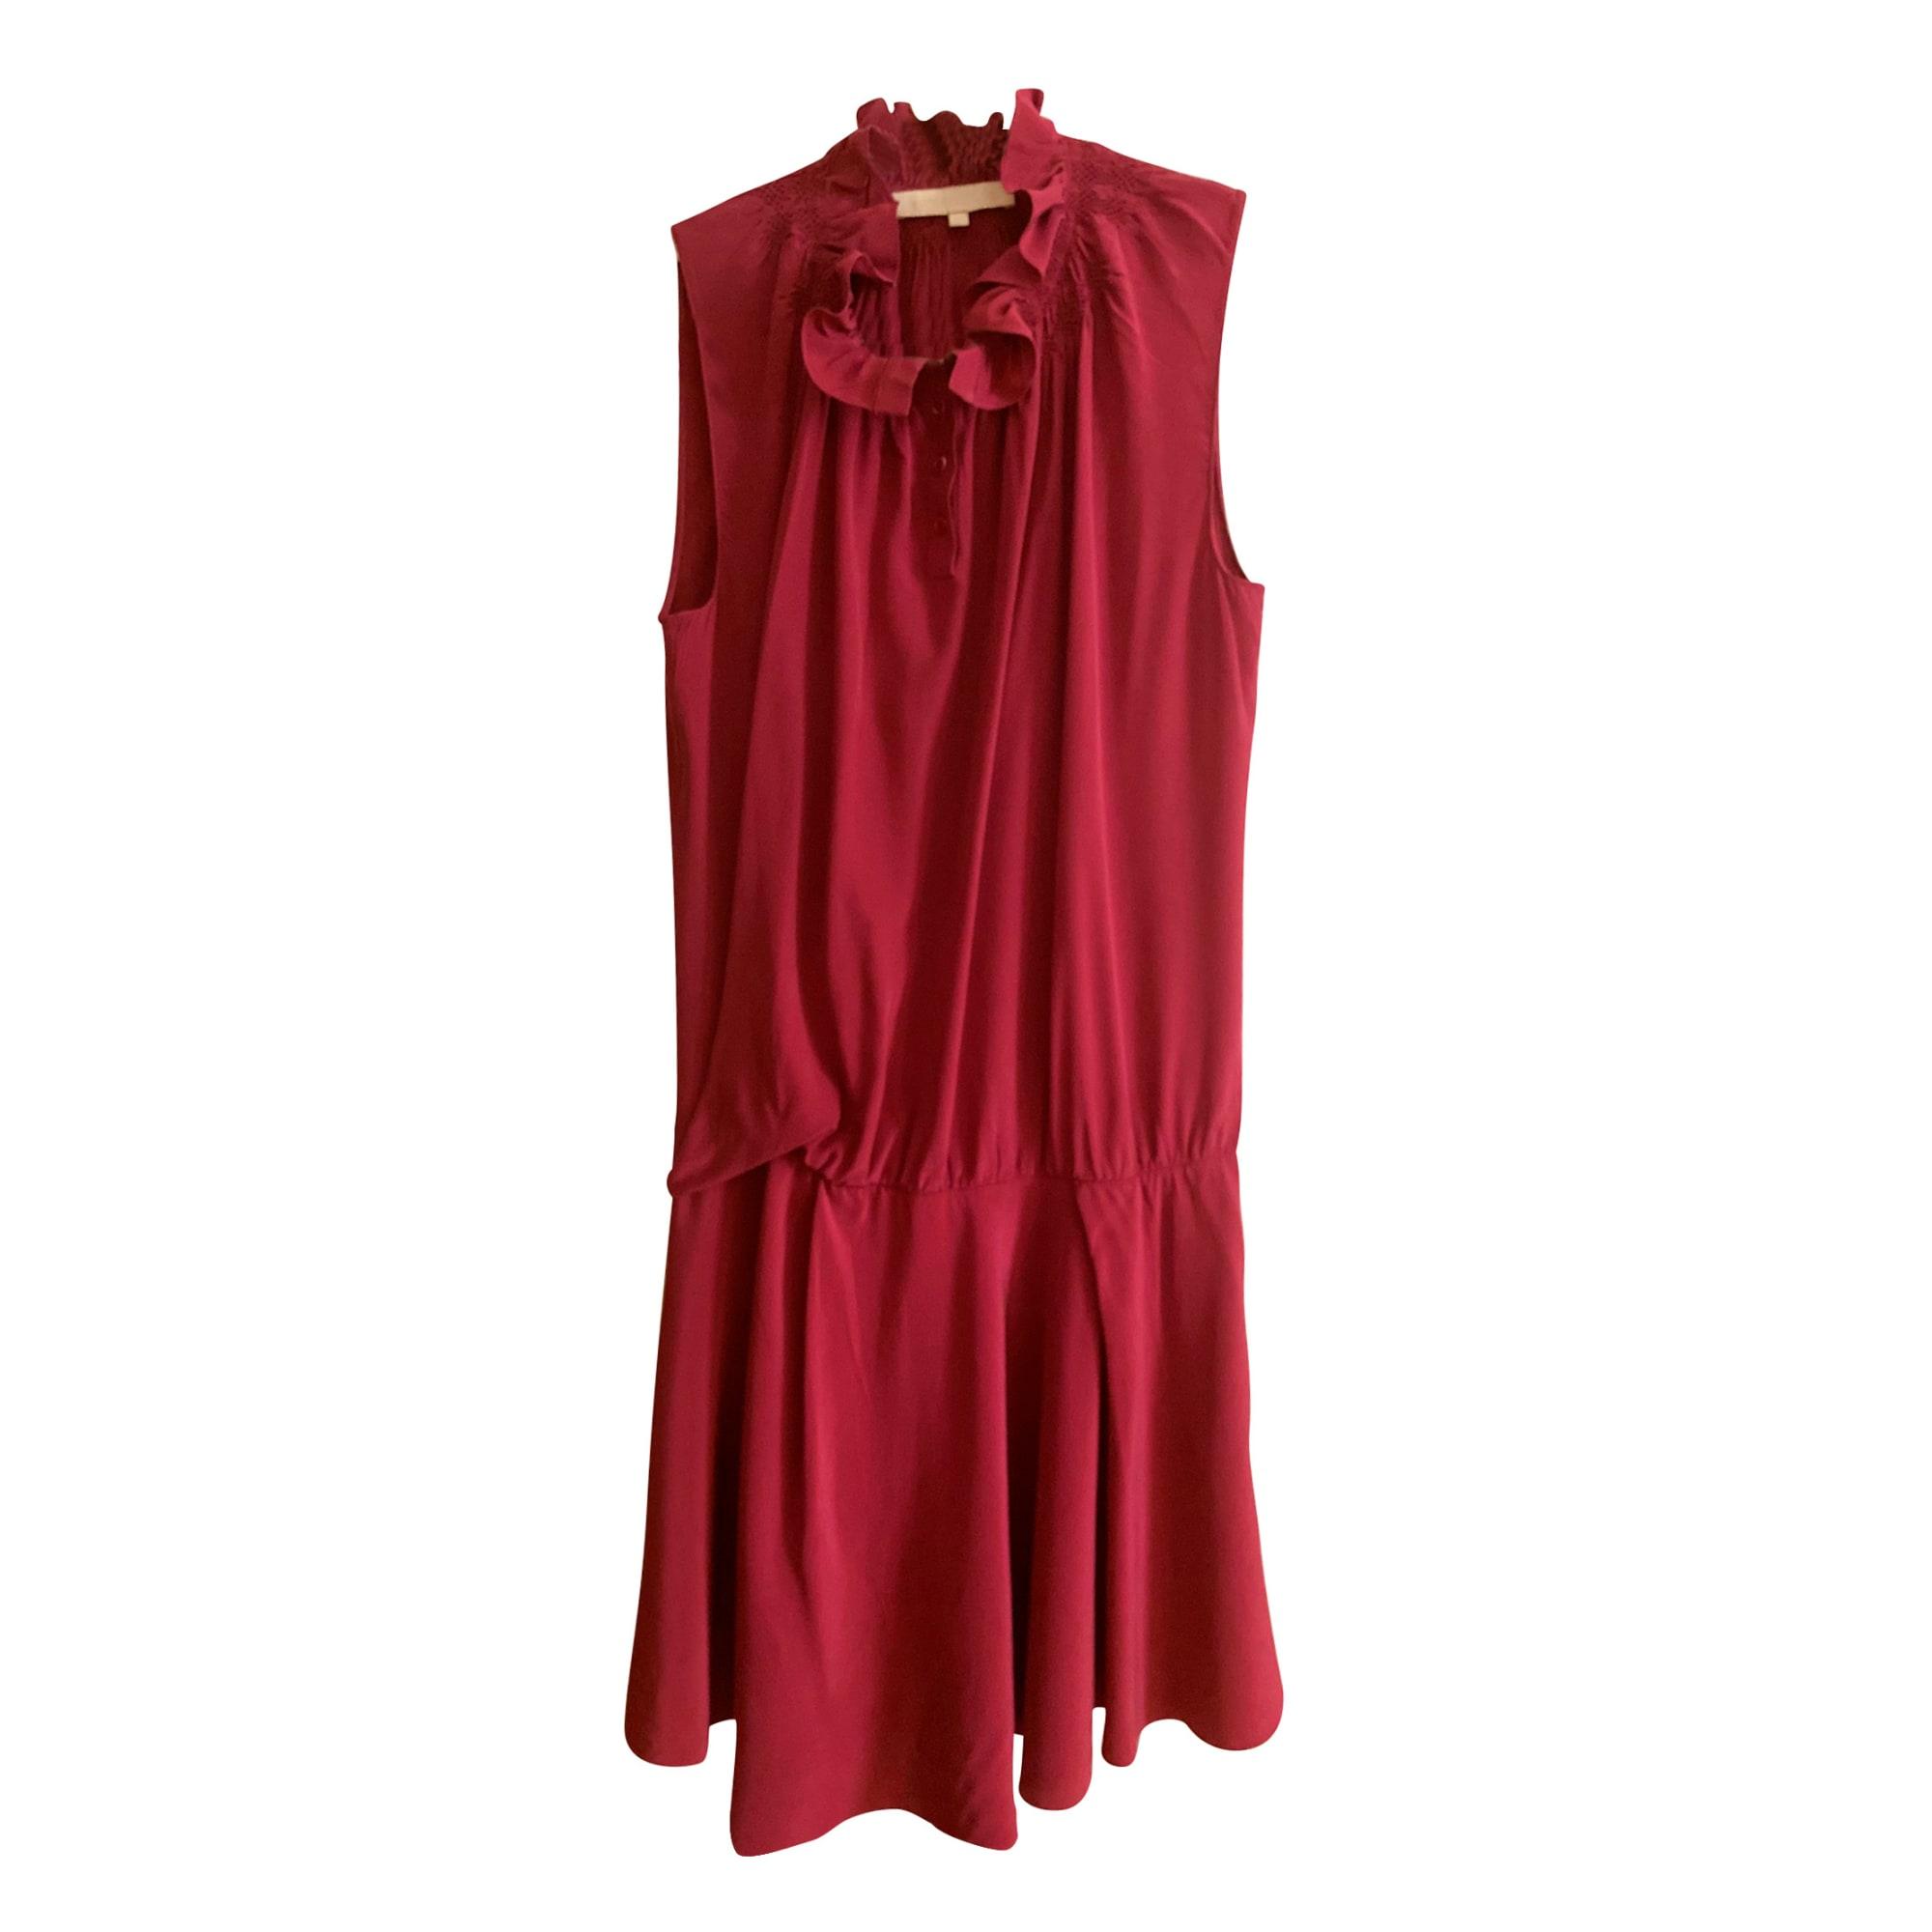 Robe mi-longue VANESSA BRUNO Rose, fuschia, vieux rose